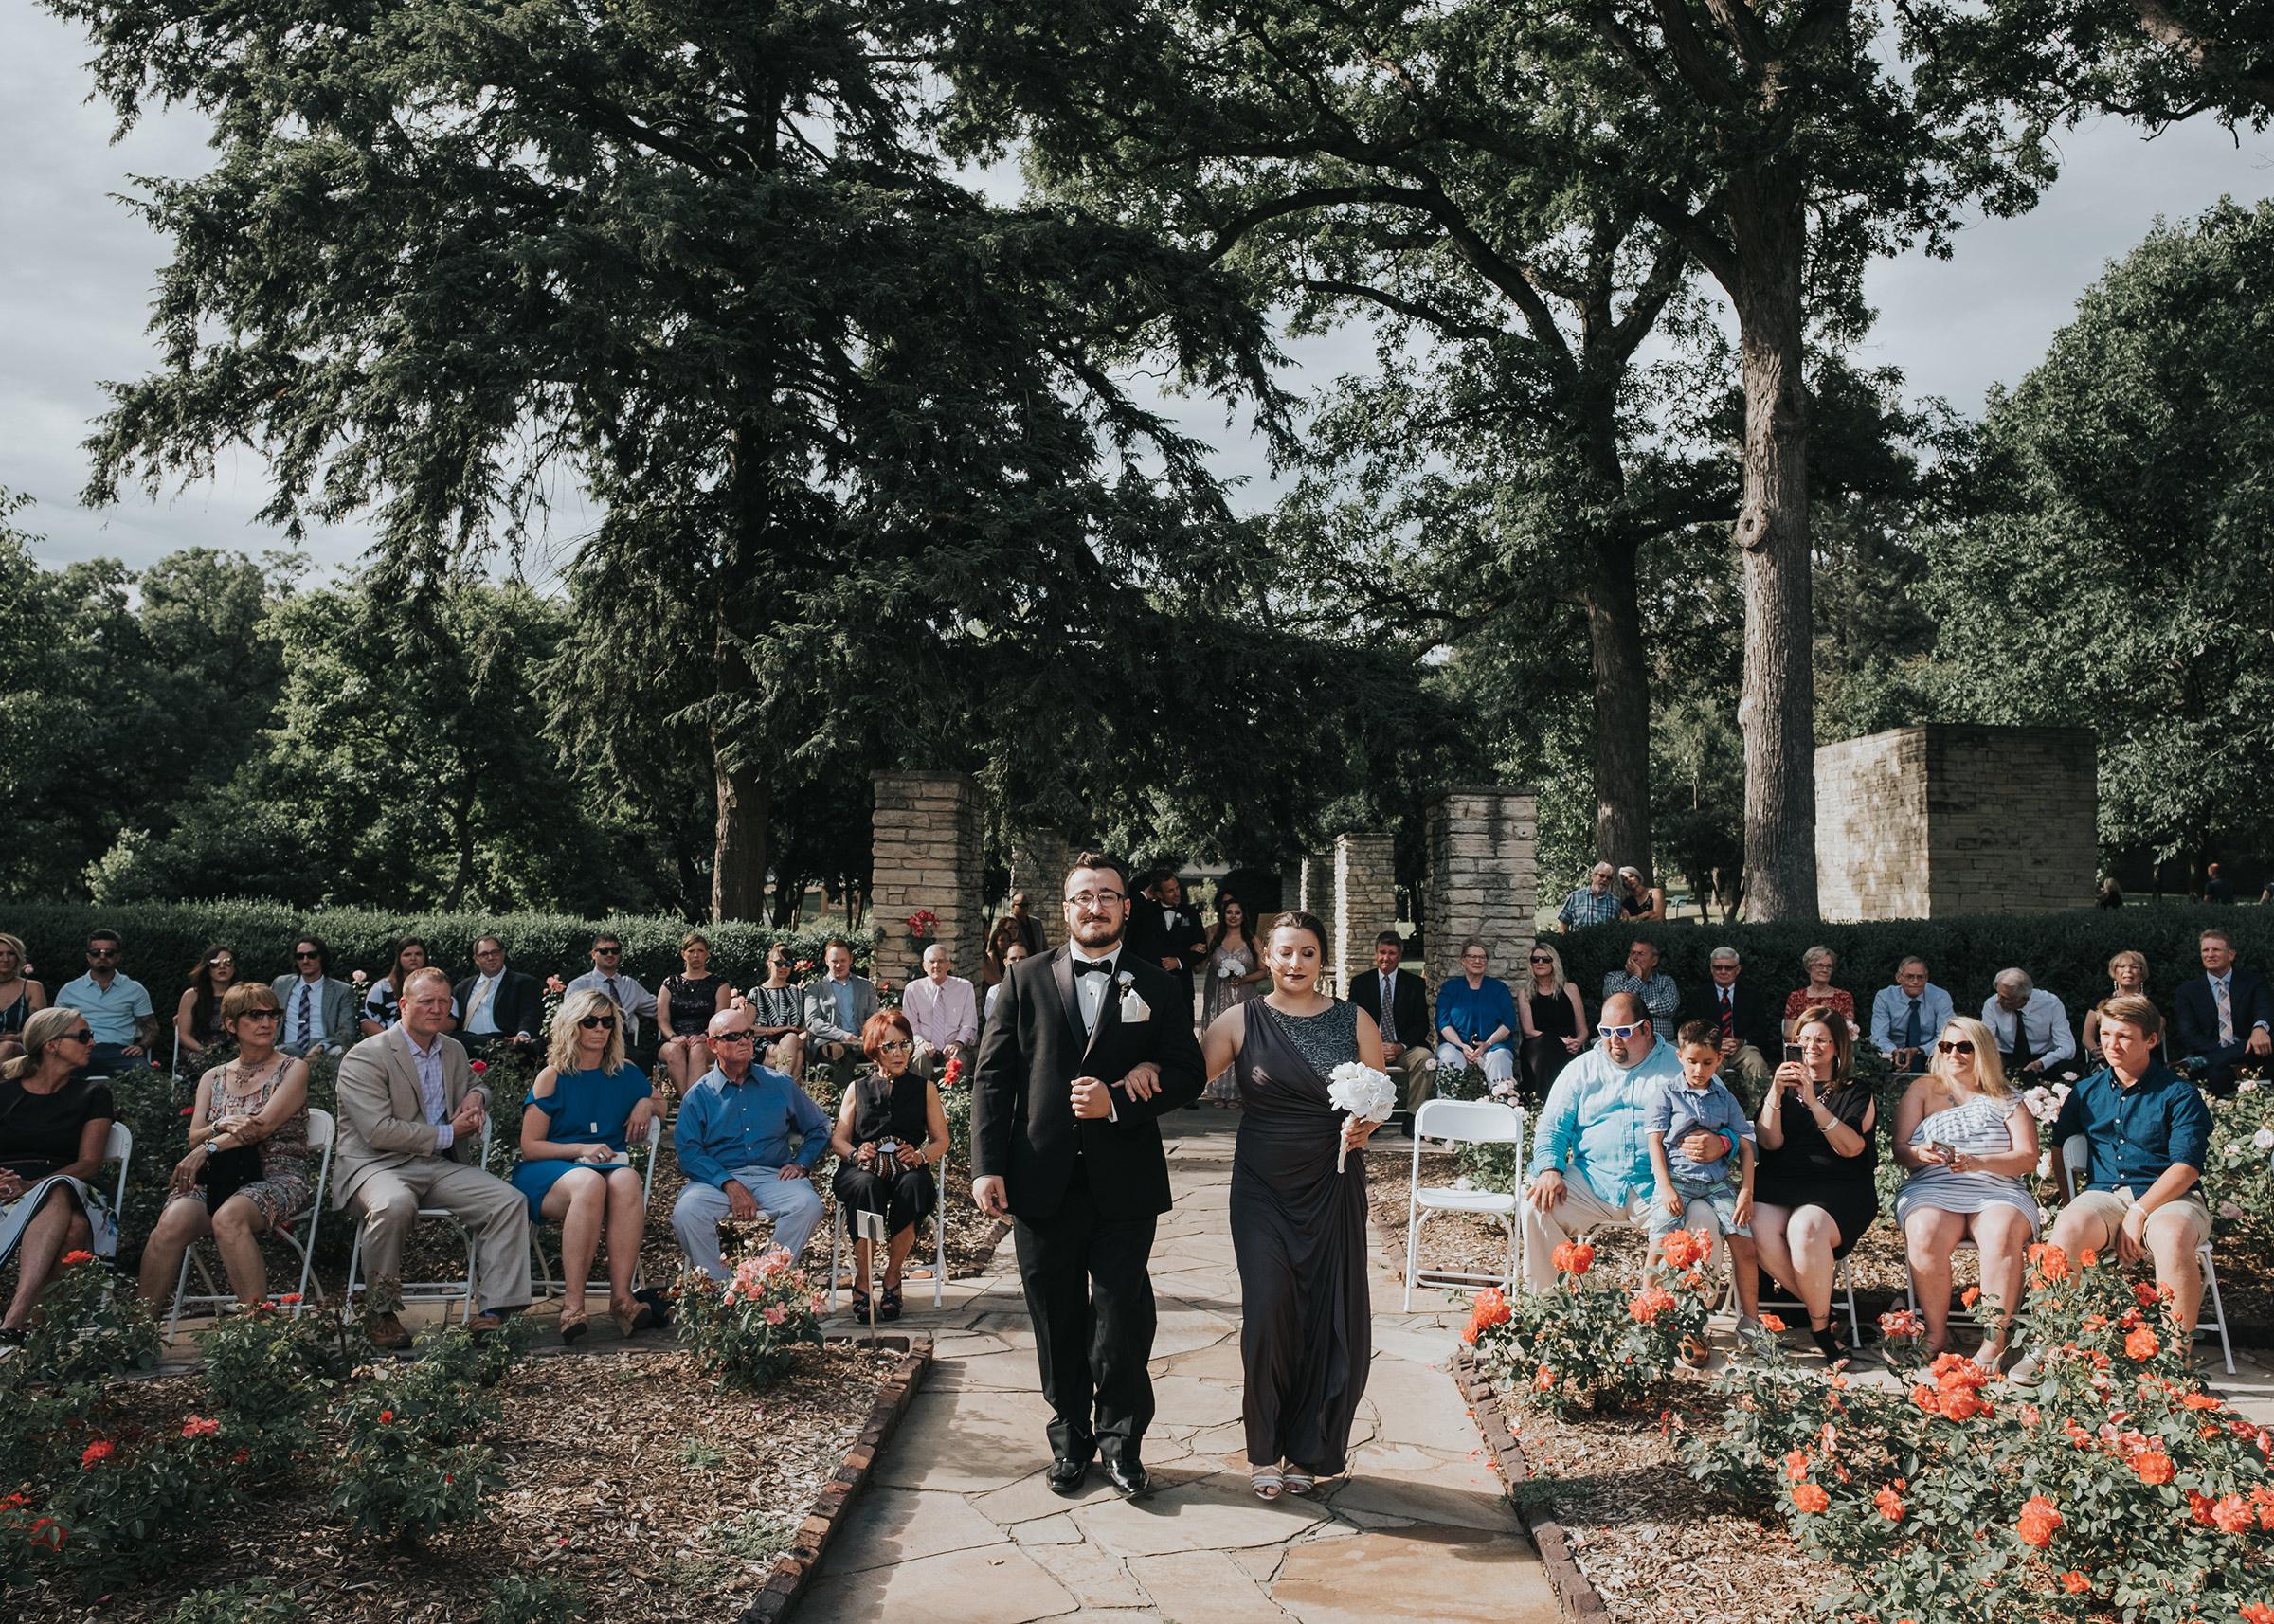 bridesmaid-groomsmen-walking-down-aisle-during-ceremony-desmoines-iowa-rose-garden-raelyn-ramey-photography.jpg